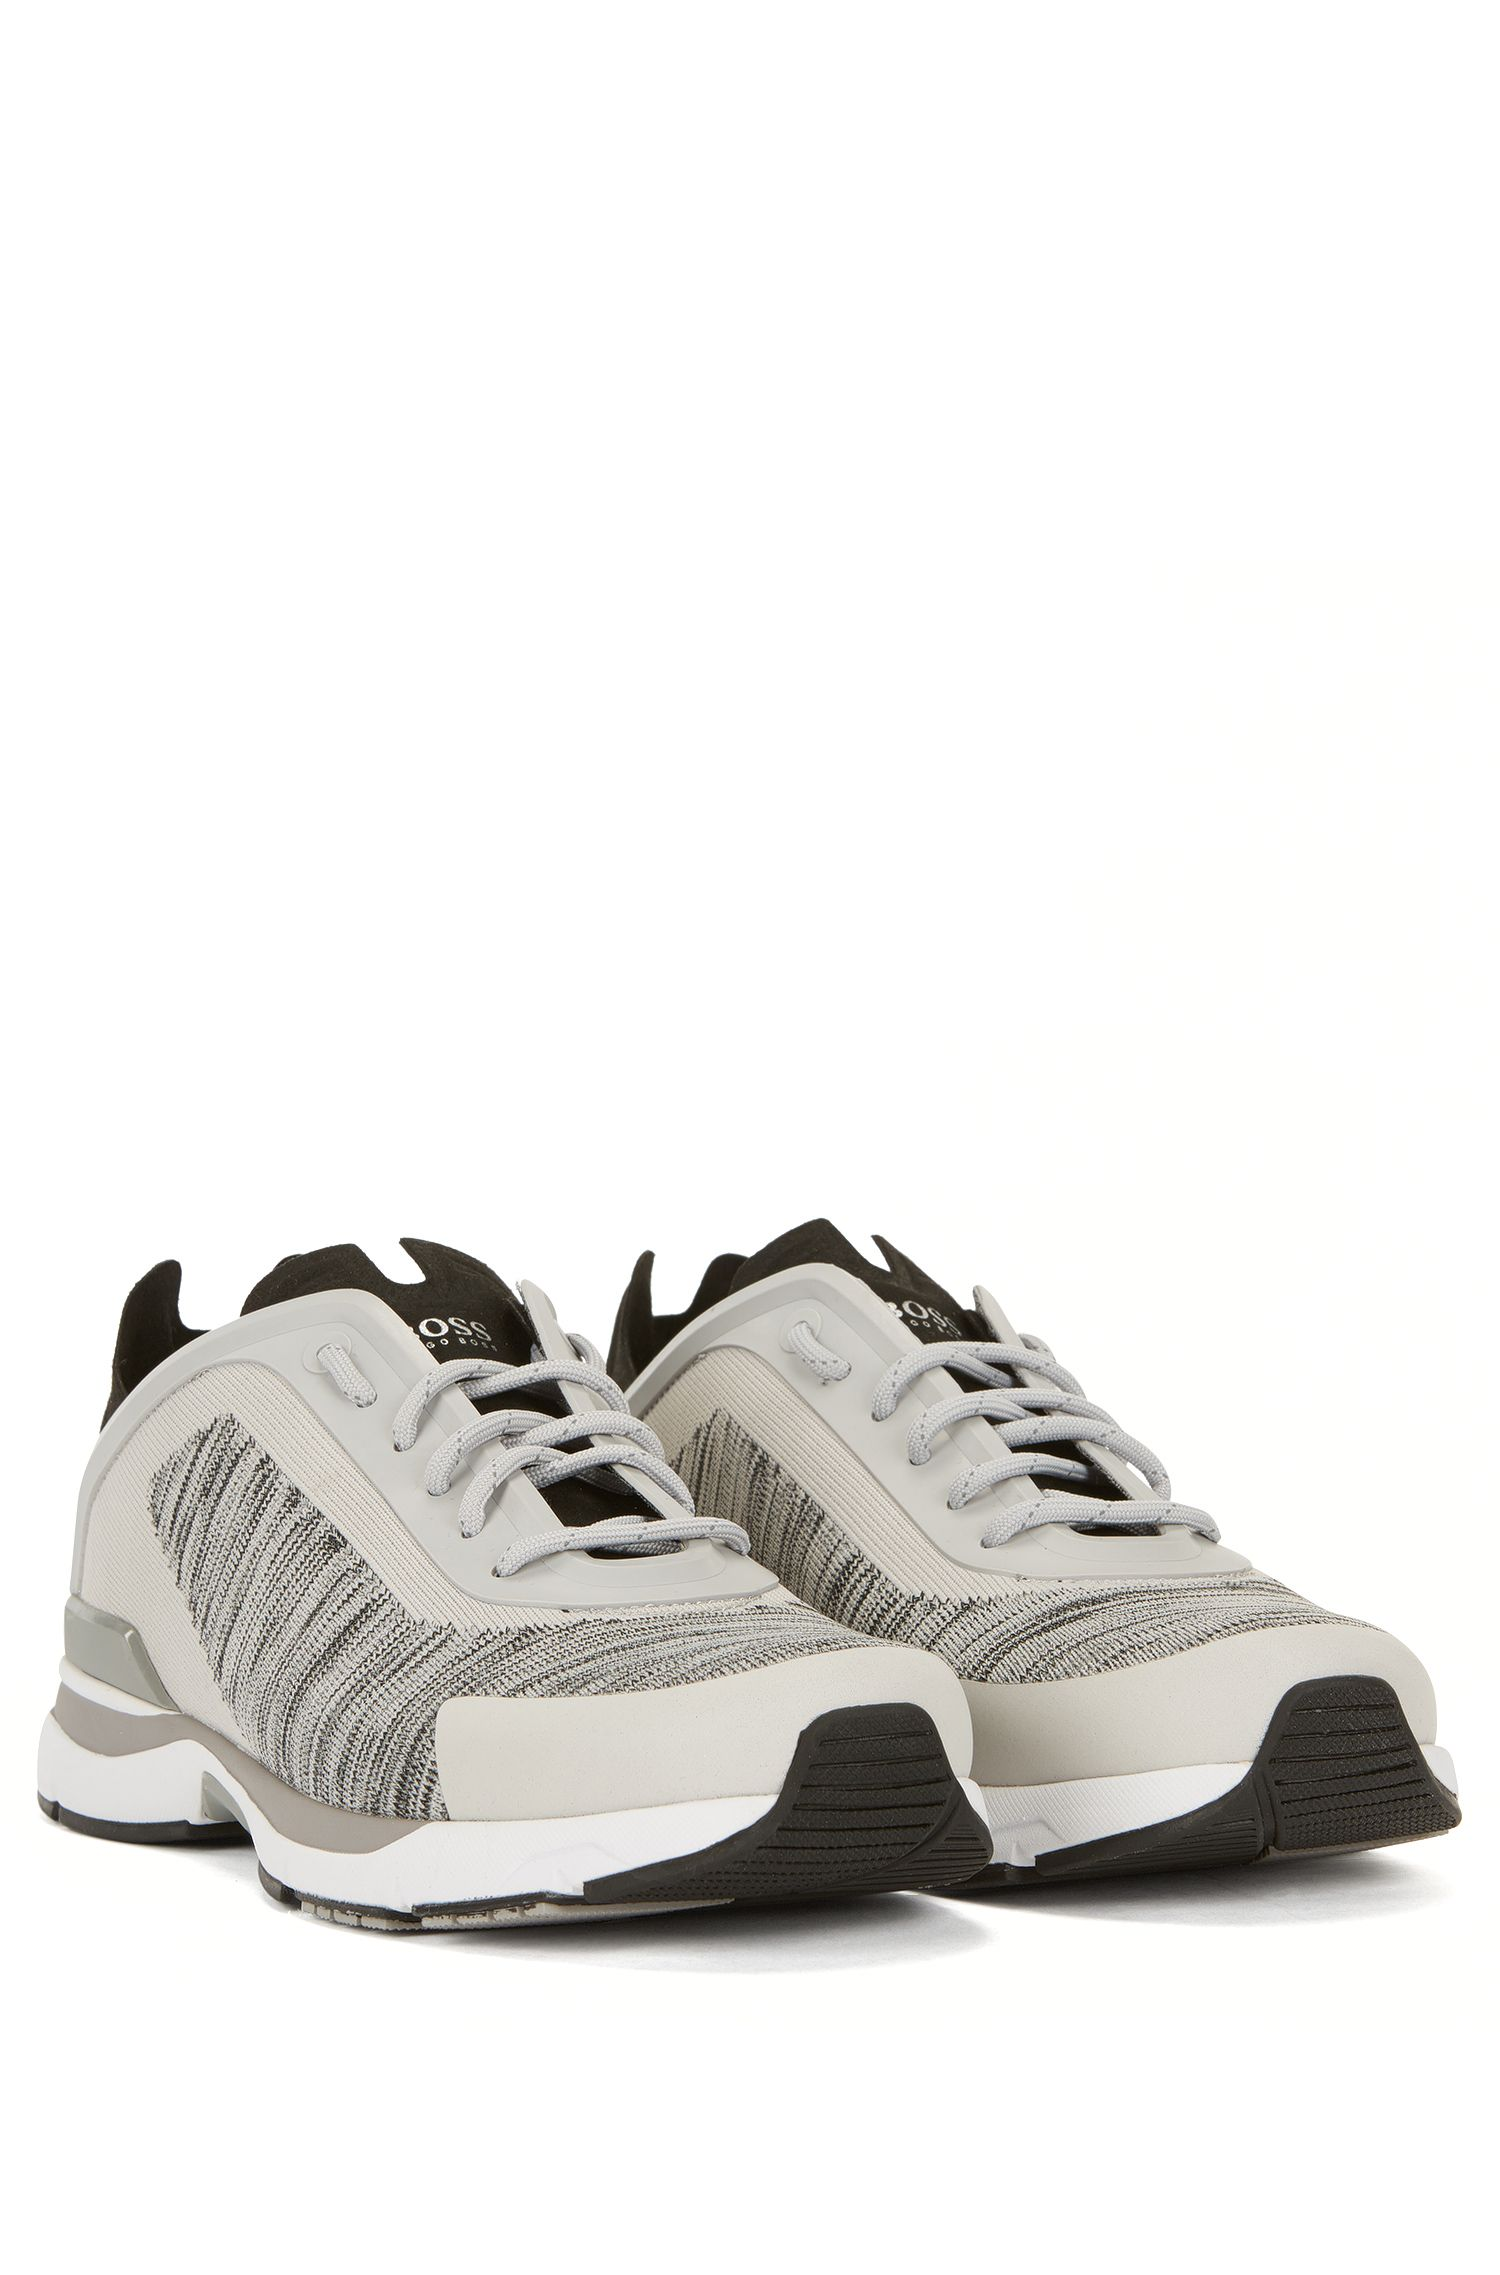 Sneakers aus Material-Mix im Laufschuh-Stil